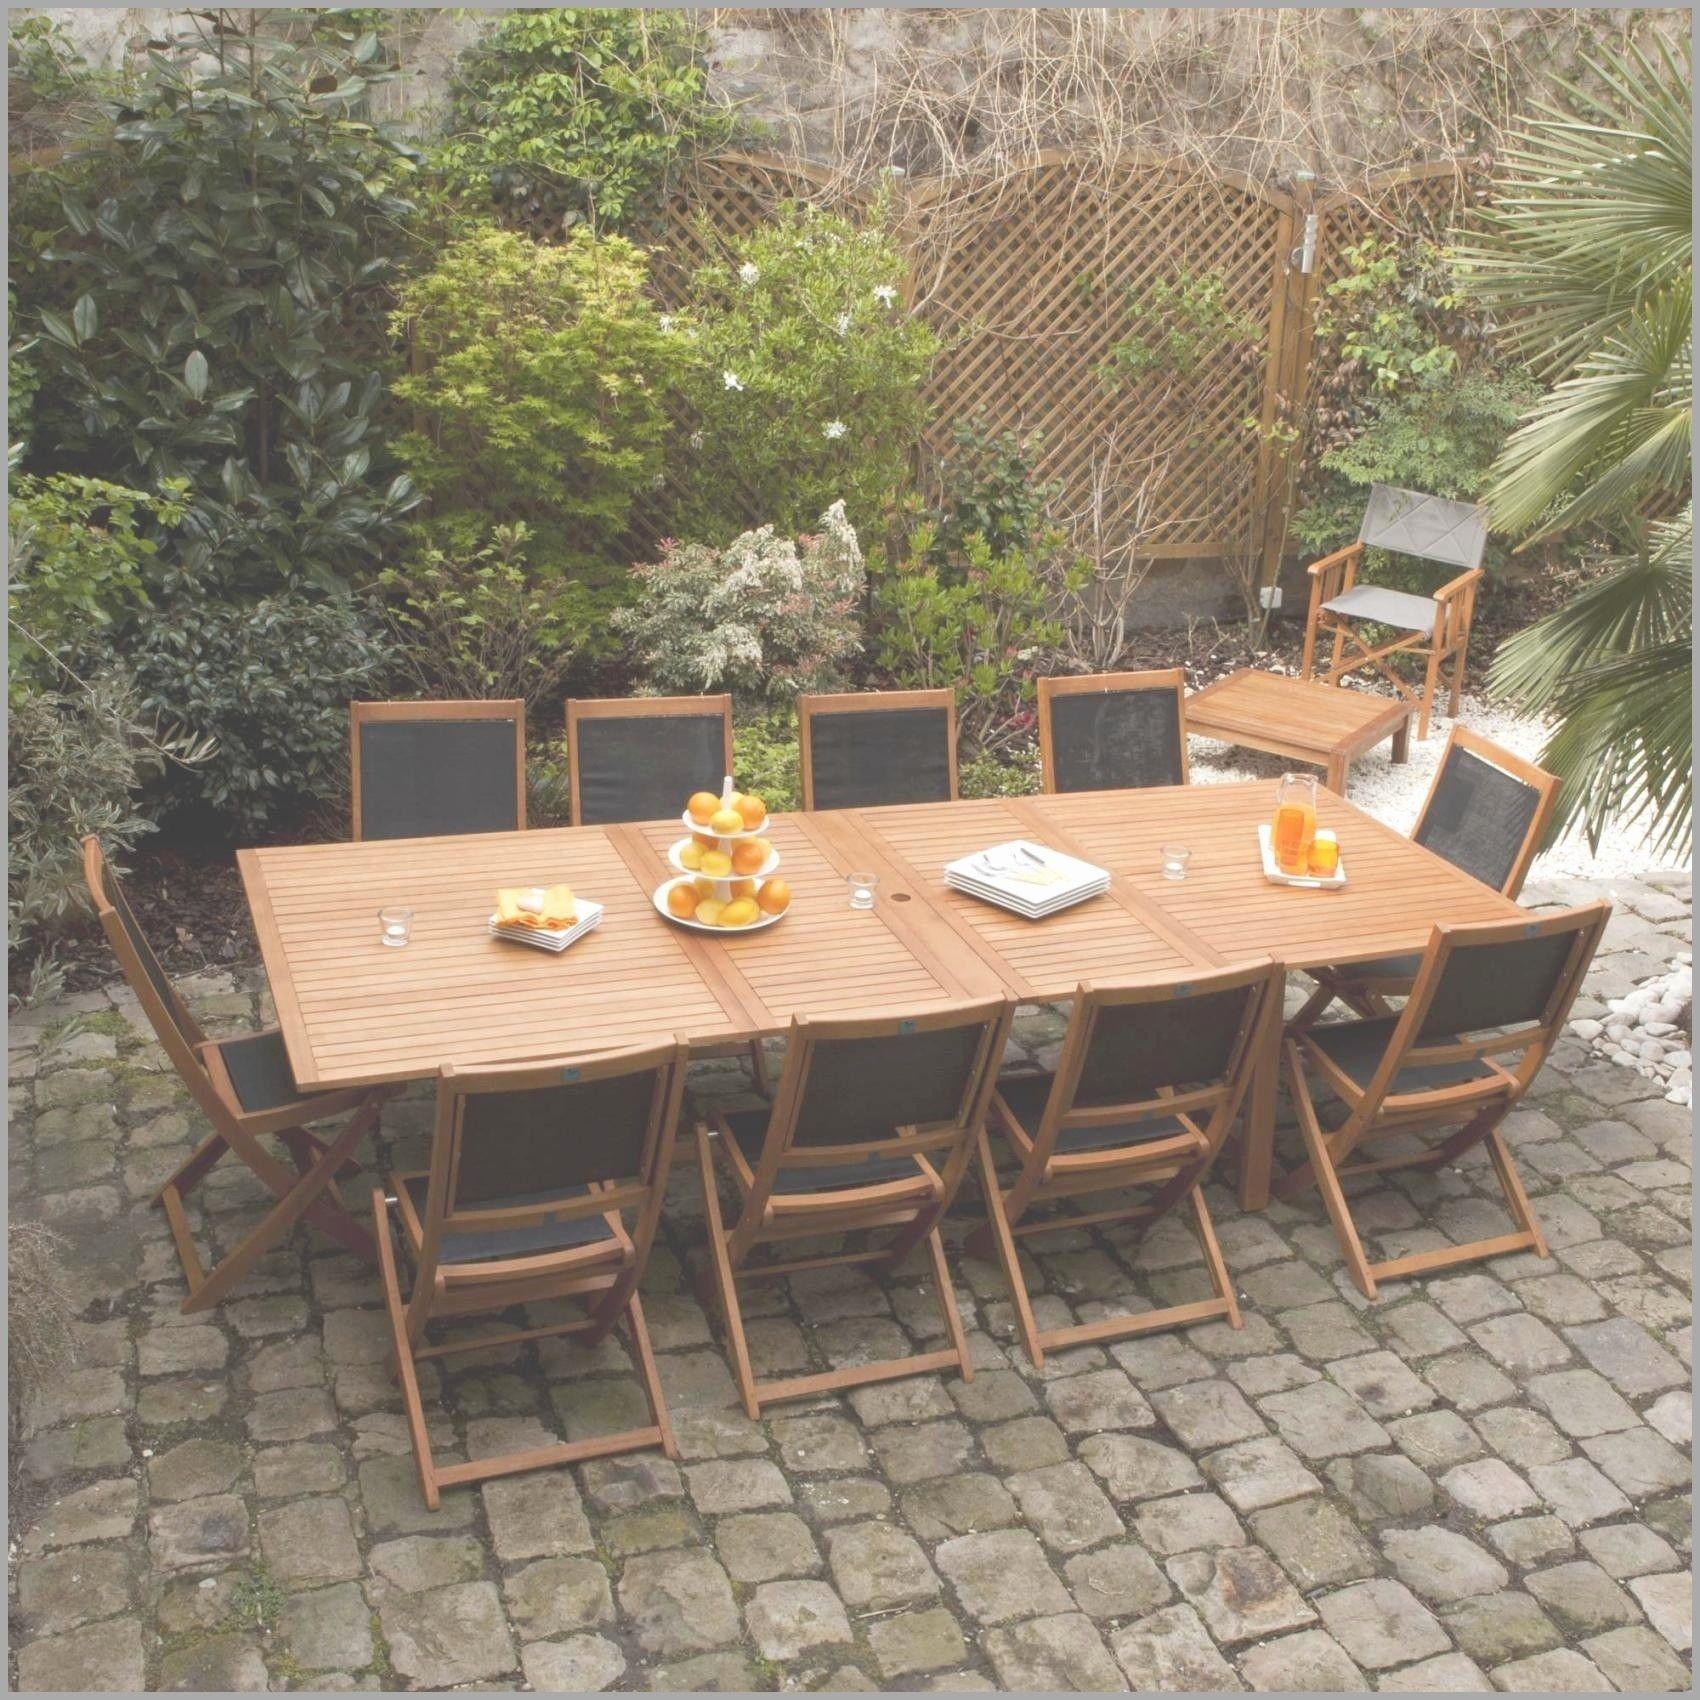 Table En Resine Tressée Best Of Stunning Salon De Jardin Plastique Bri Arche Gallery Of 37 Best Of Table En Resine Tressée